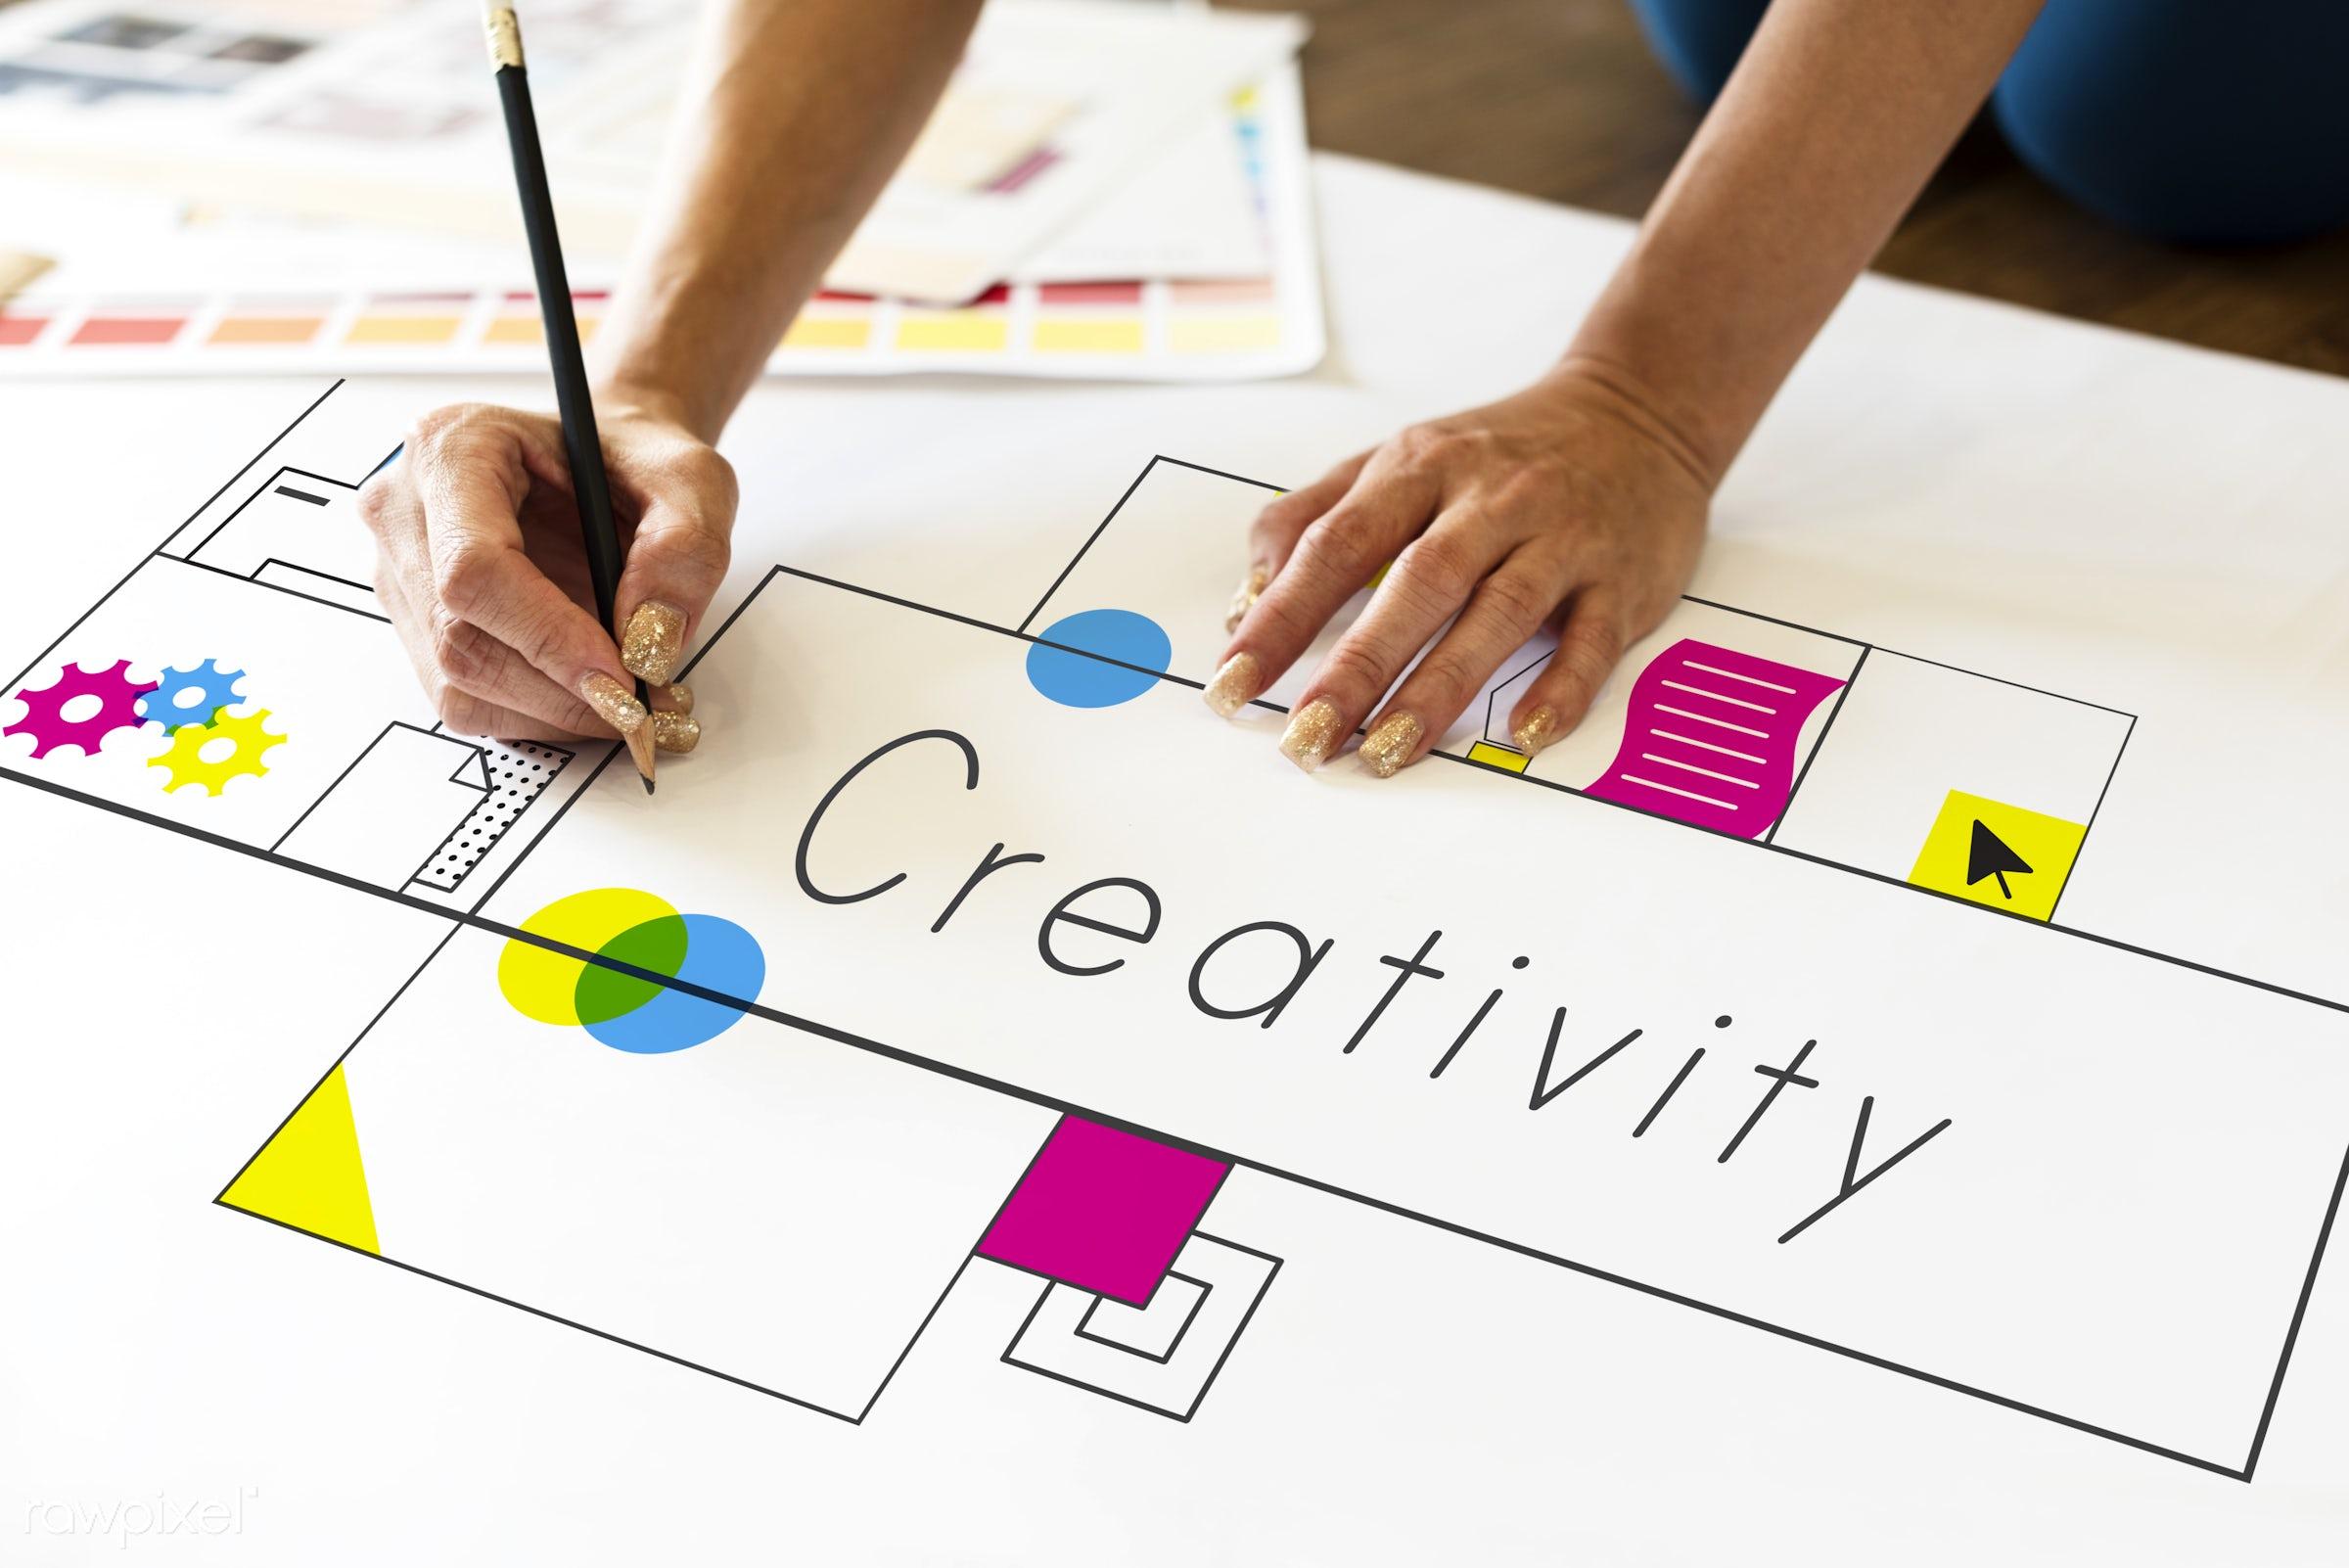 art, cmyk, creation, creative, creativity, design, drawing, graphic, hands, hobby, ideas, imagination, innovation,...